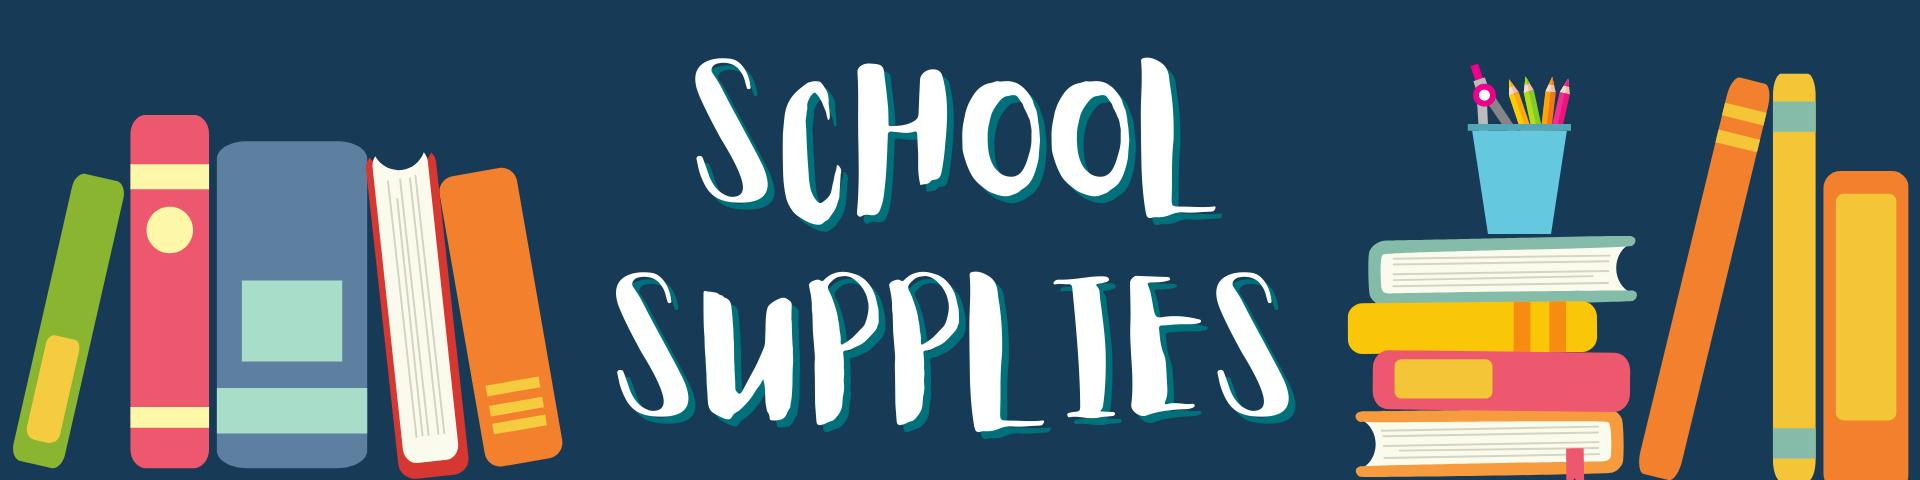 School Supplies Banner